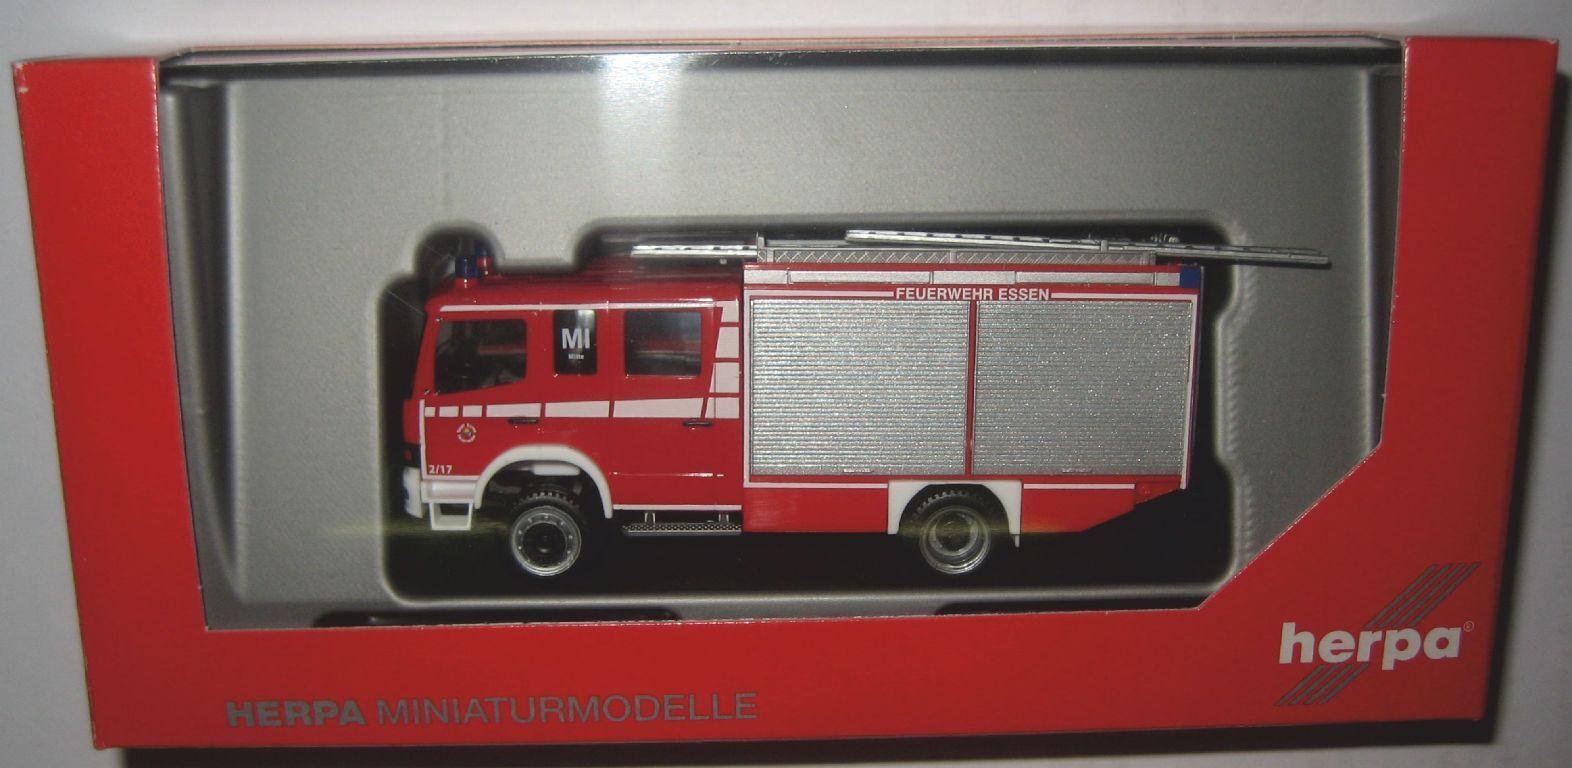 Herpa 093750 Mo Atego HLF pompiers volontaires manger-Centre 1 87 voie HO